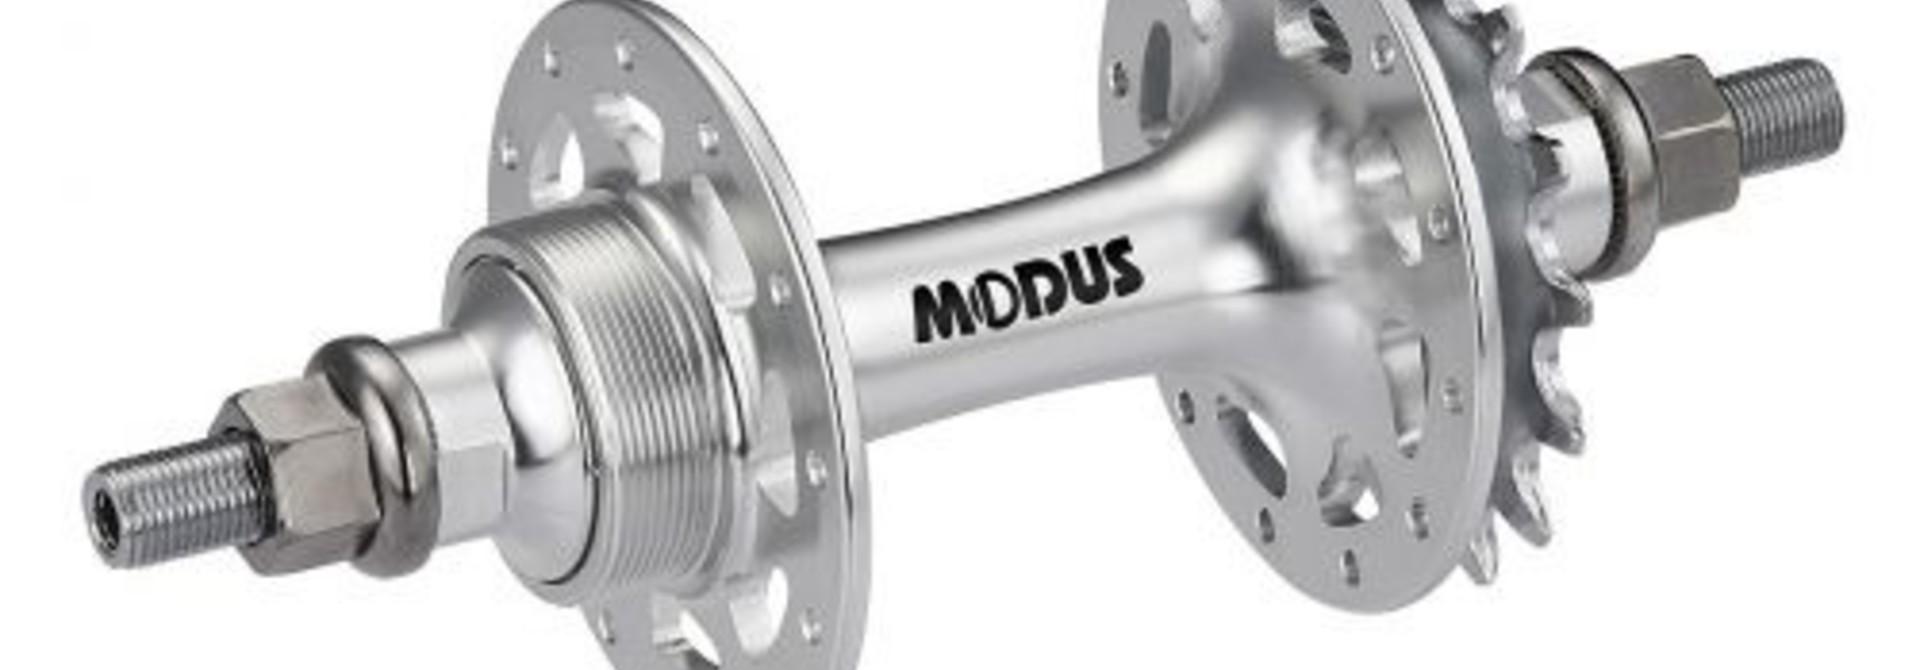 MODUS HIGH FLANGE REAR TRACK HUB